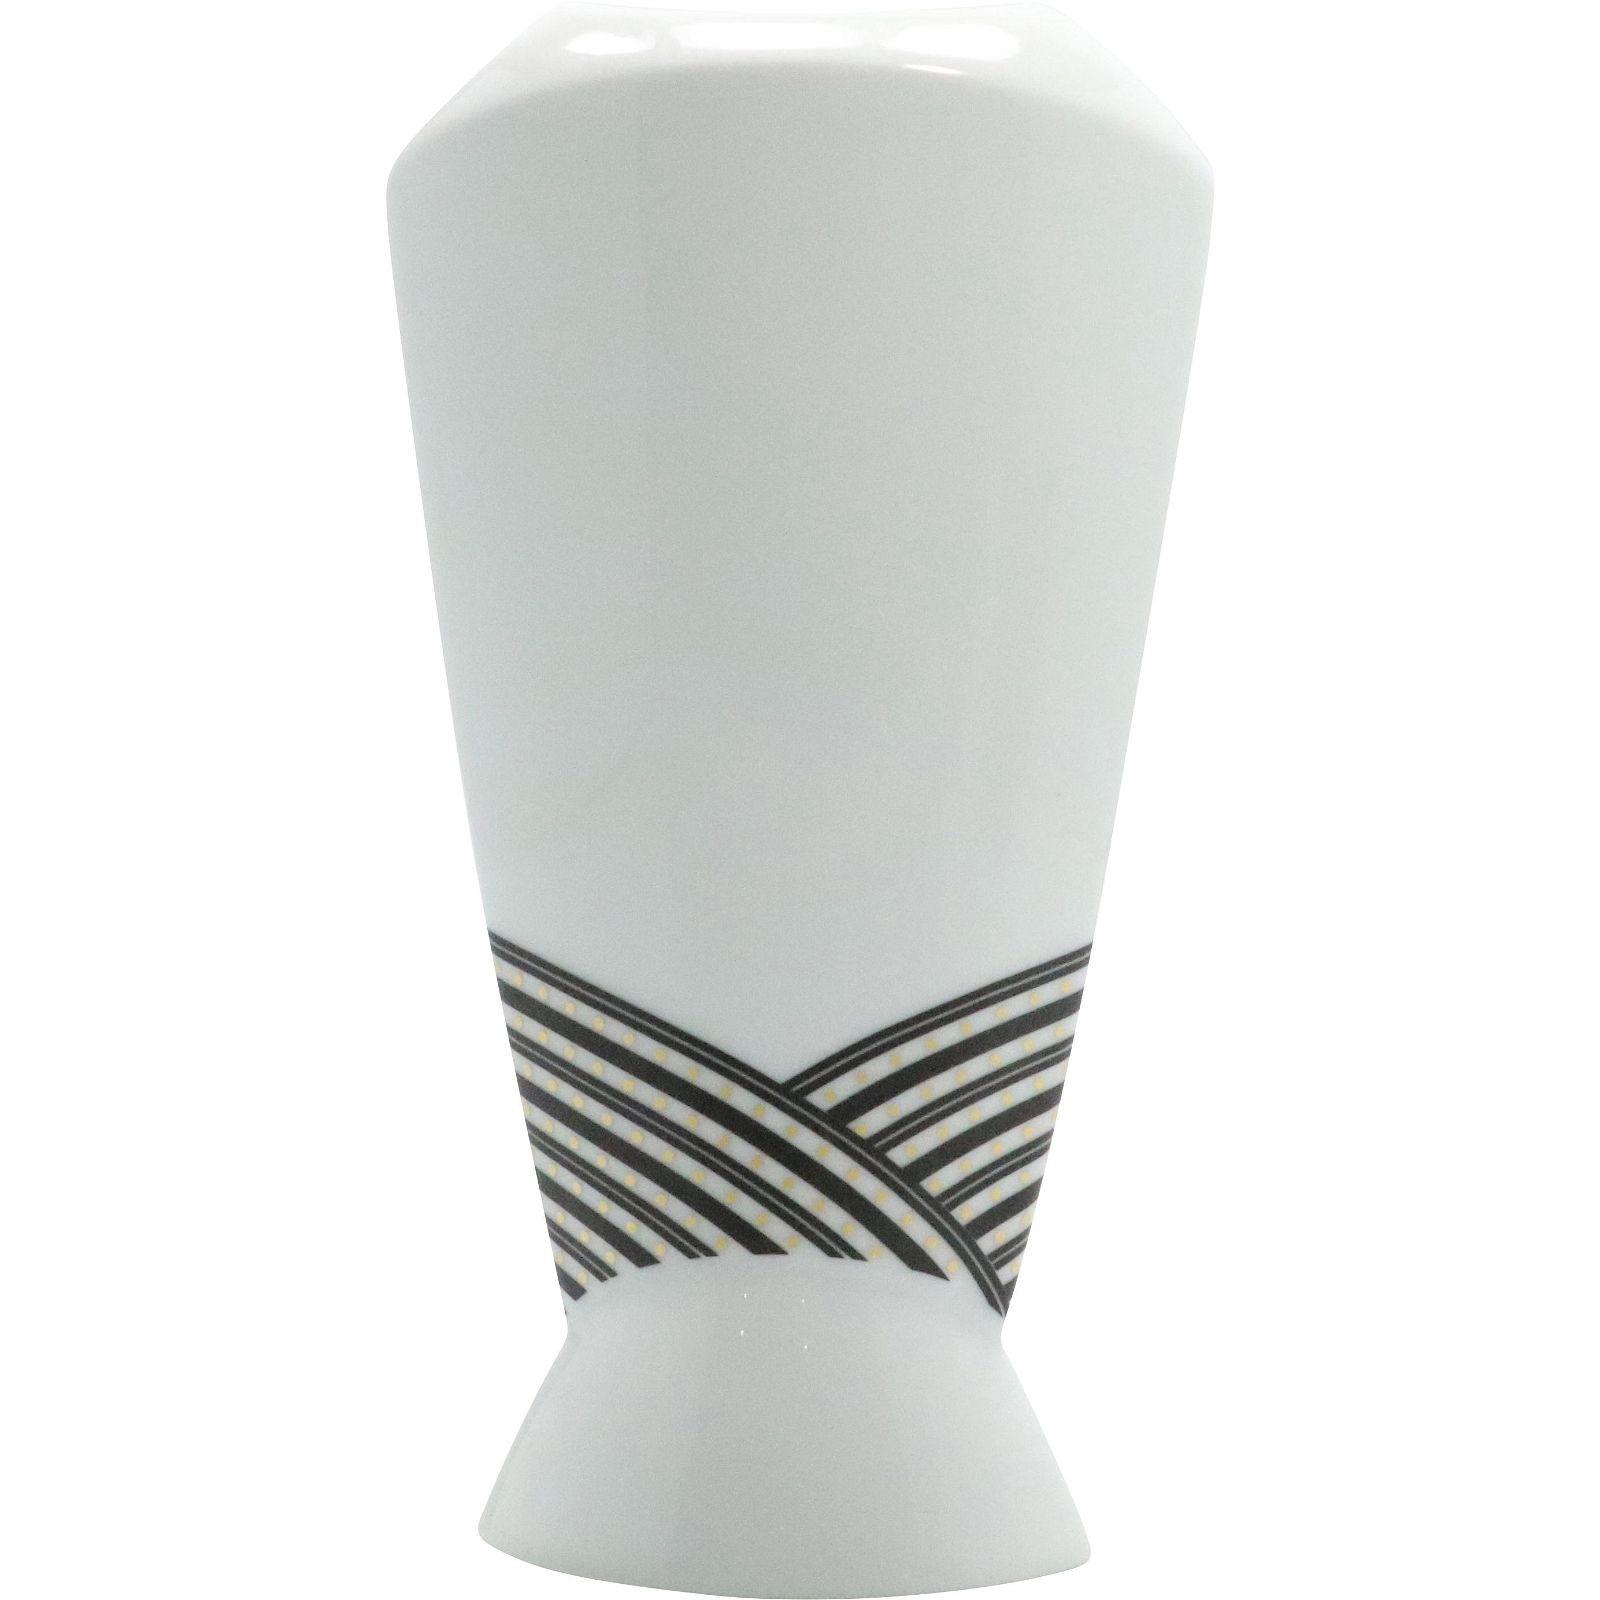 Rosenthal Studio Line White and Black Gold Dotted Vase